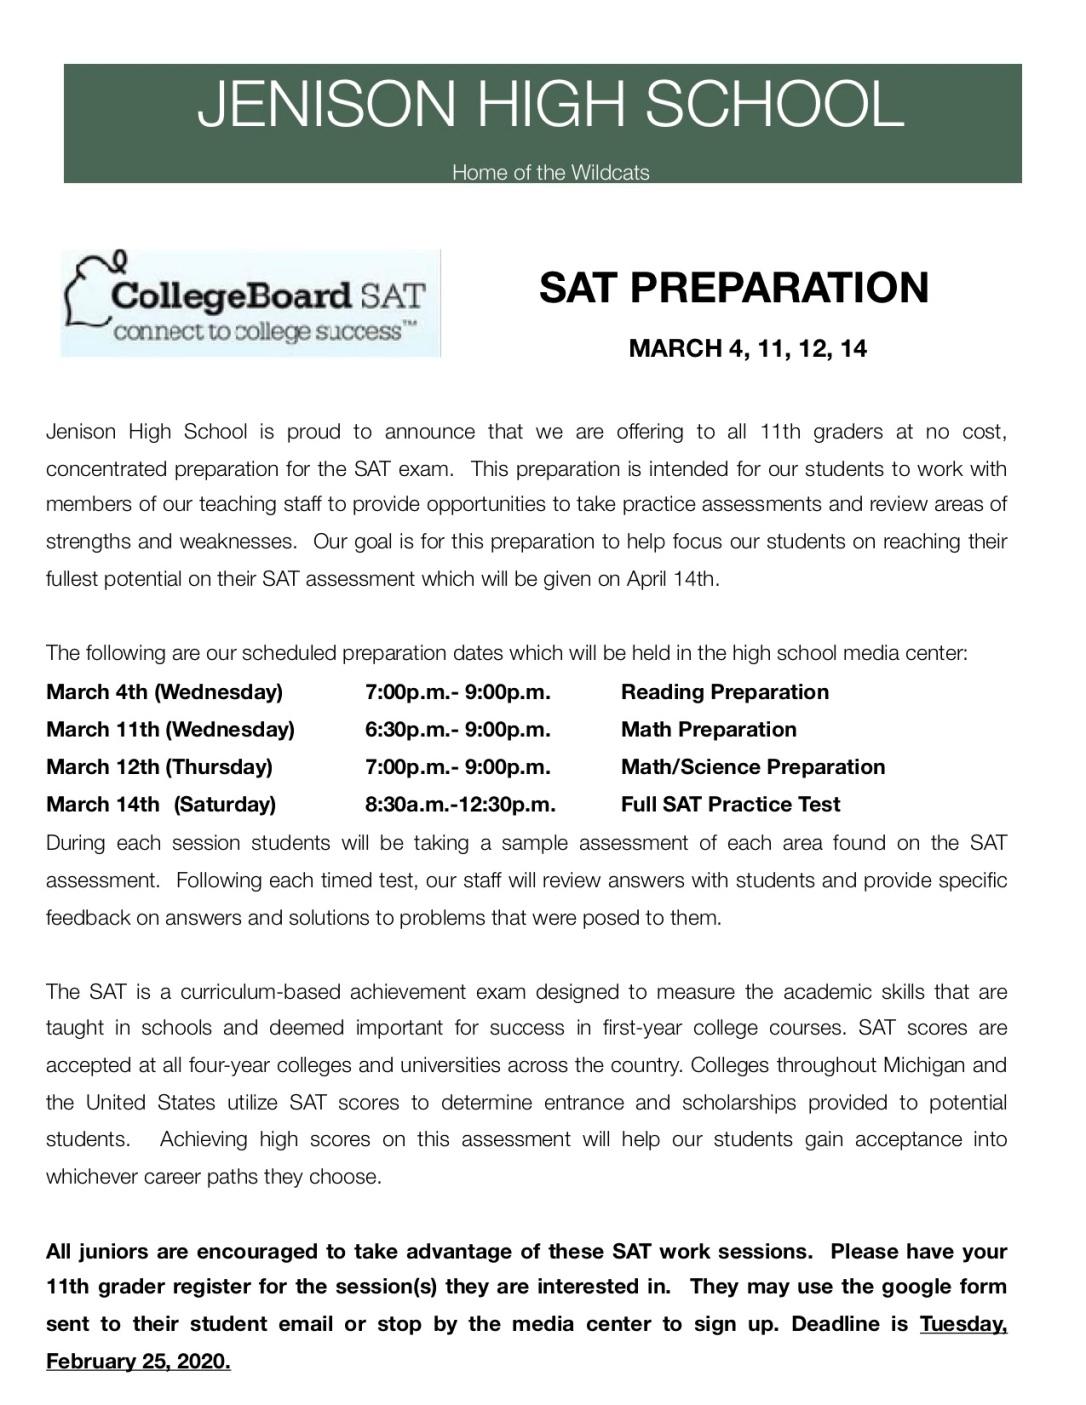 SAT PREPARATION NIGHT 2020 copy